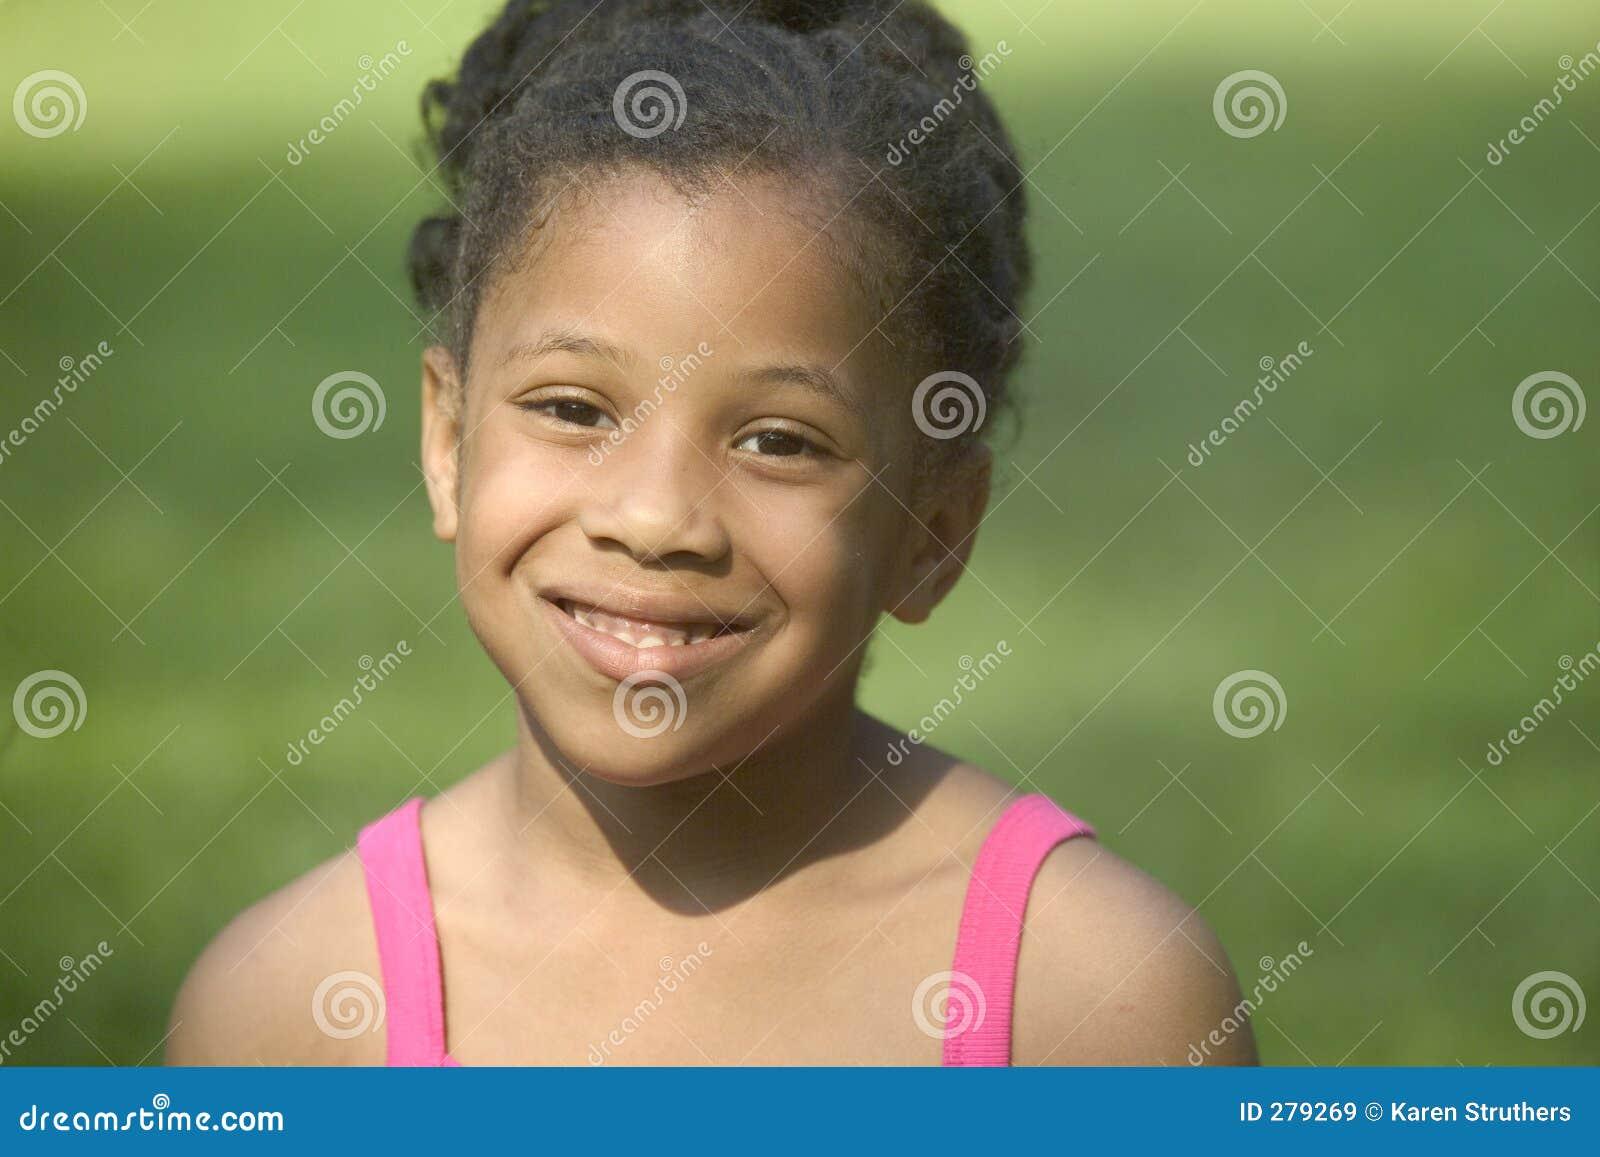 Weinig glimlach van een meisje